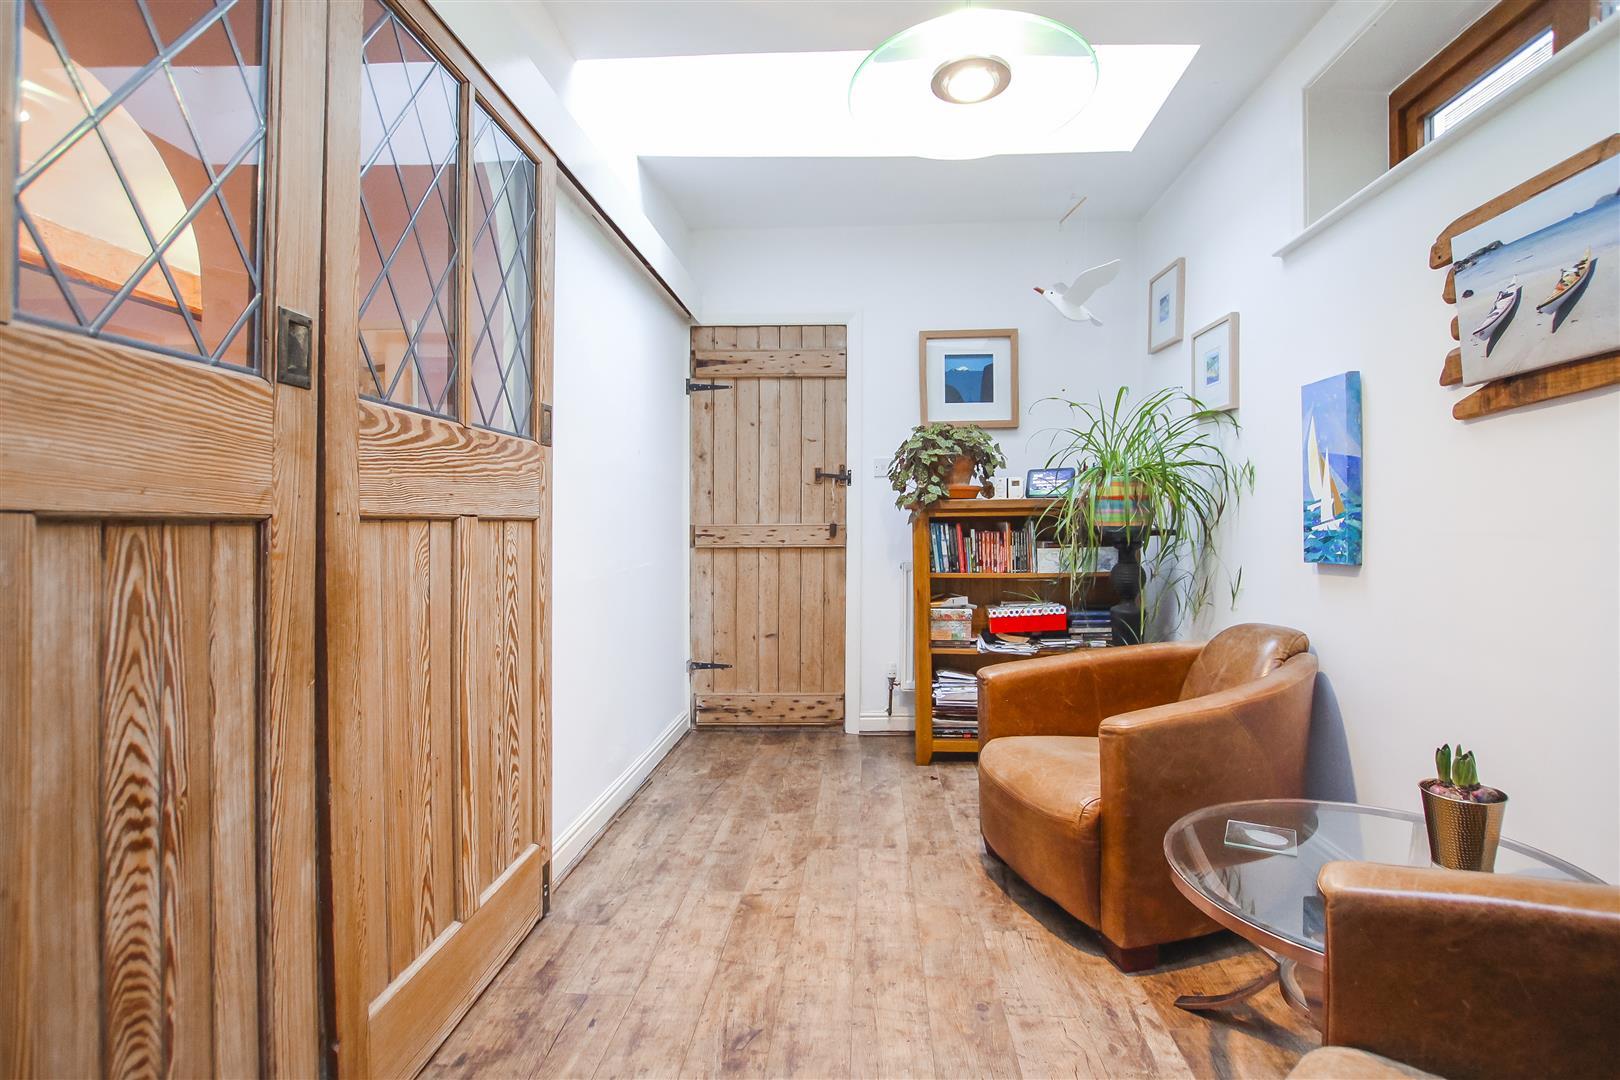 2 Bedroom Cottage For Sale - Third Reception Room